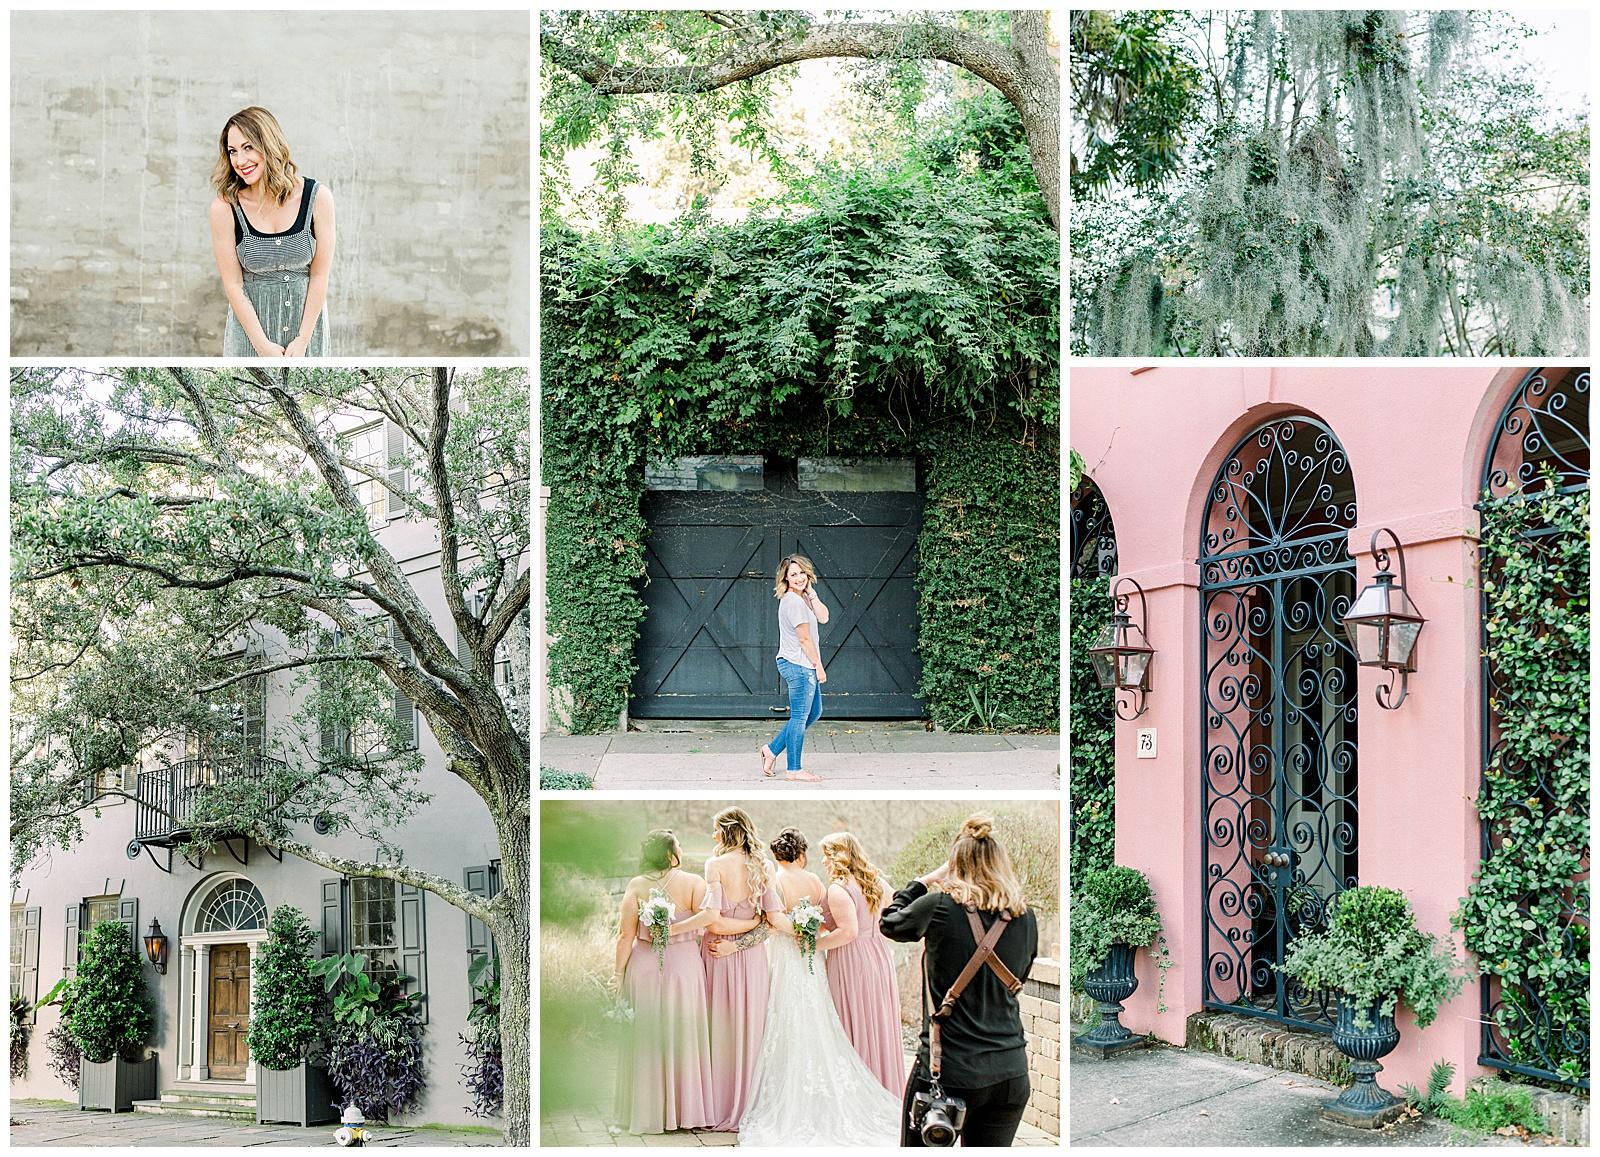 kara-blakeman-photography-west-virginia-charleston-south-carolina-wedding-photographer-huntington-wv-2019